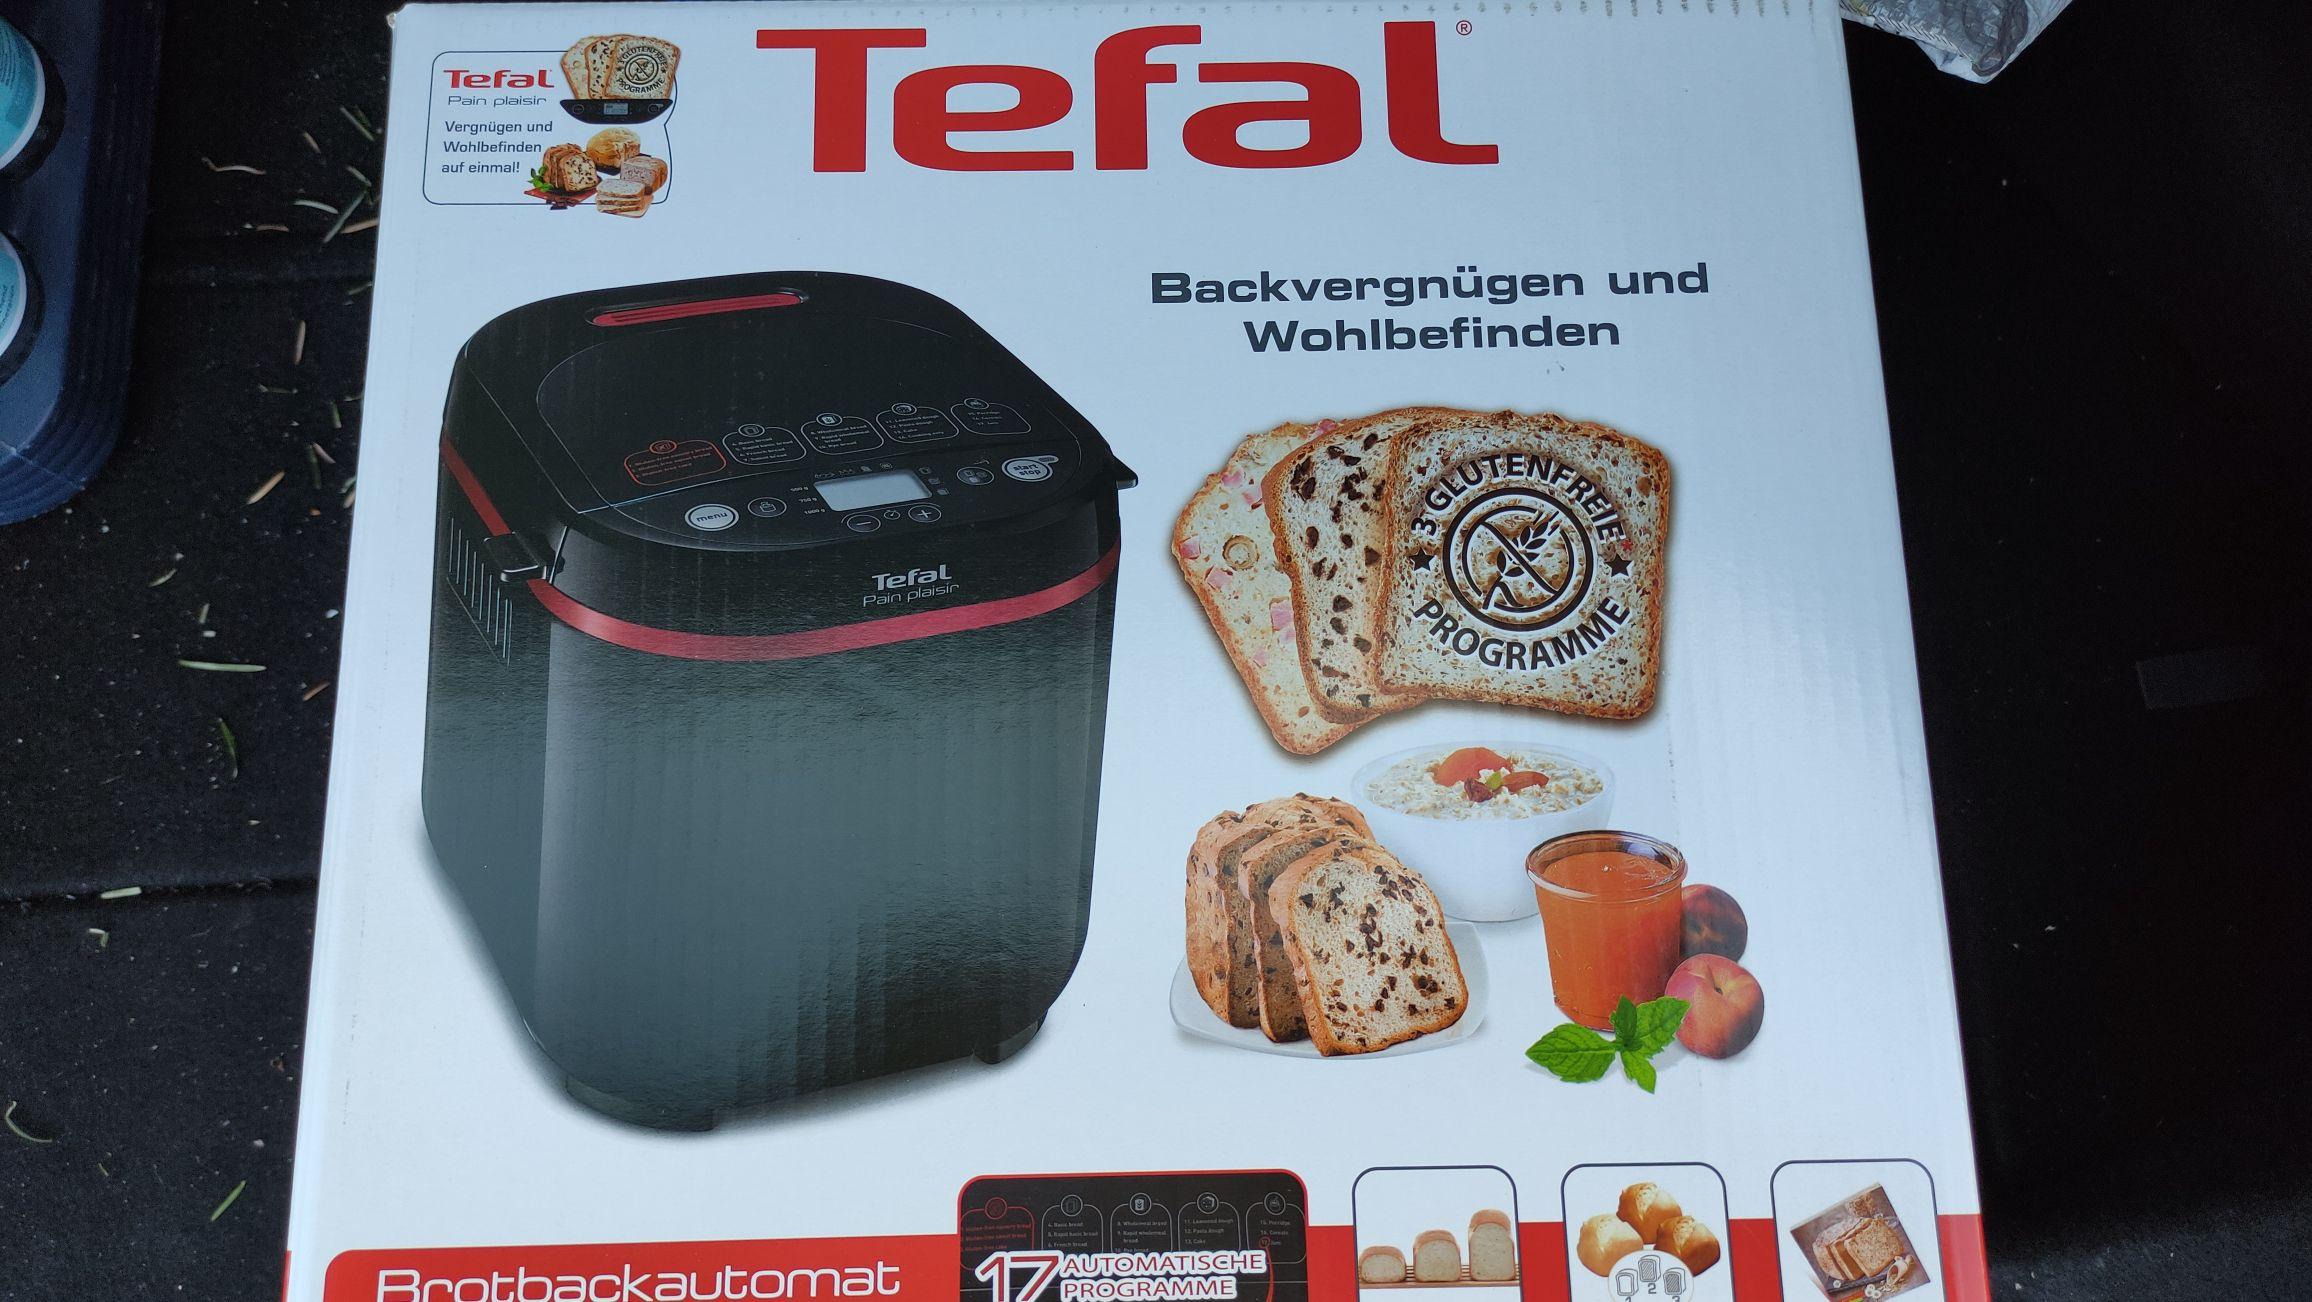 [Lokal] [Aldi Süd] Bergheim Erft Tefal Pain Plaisir Brotbackautomat